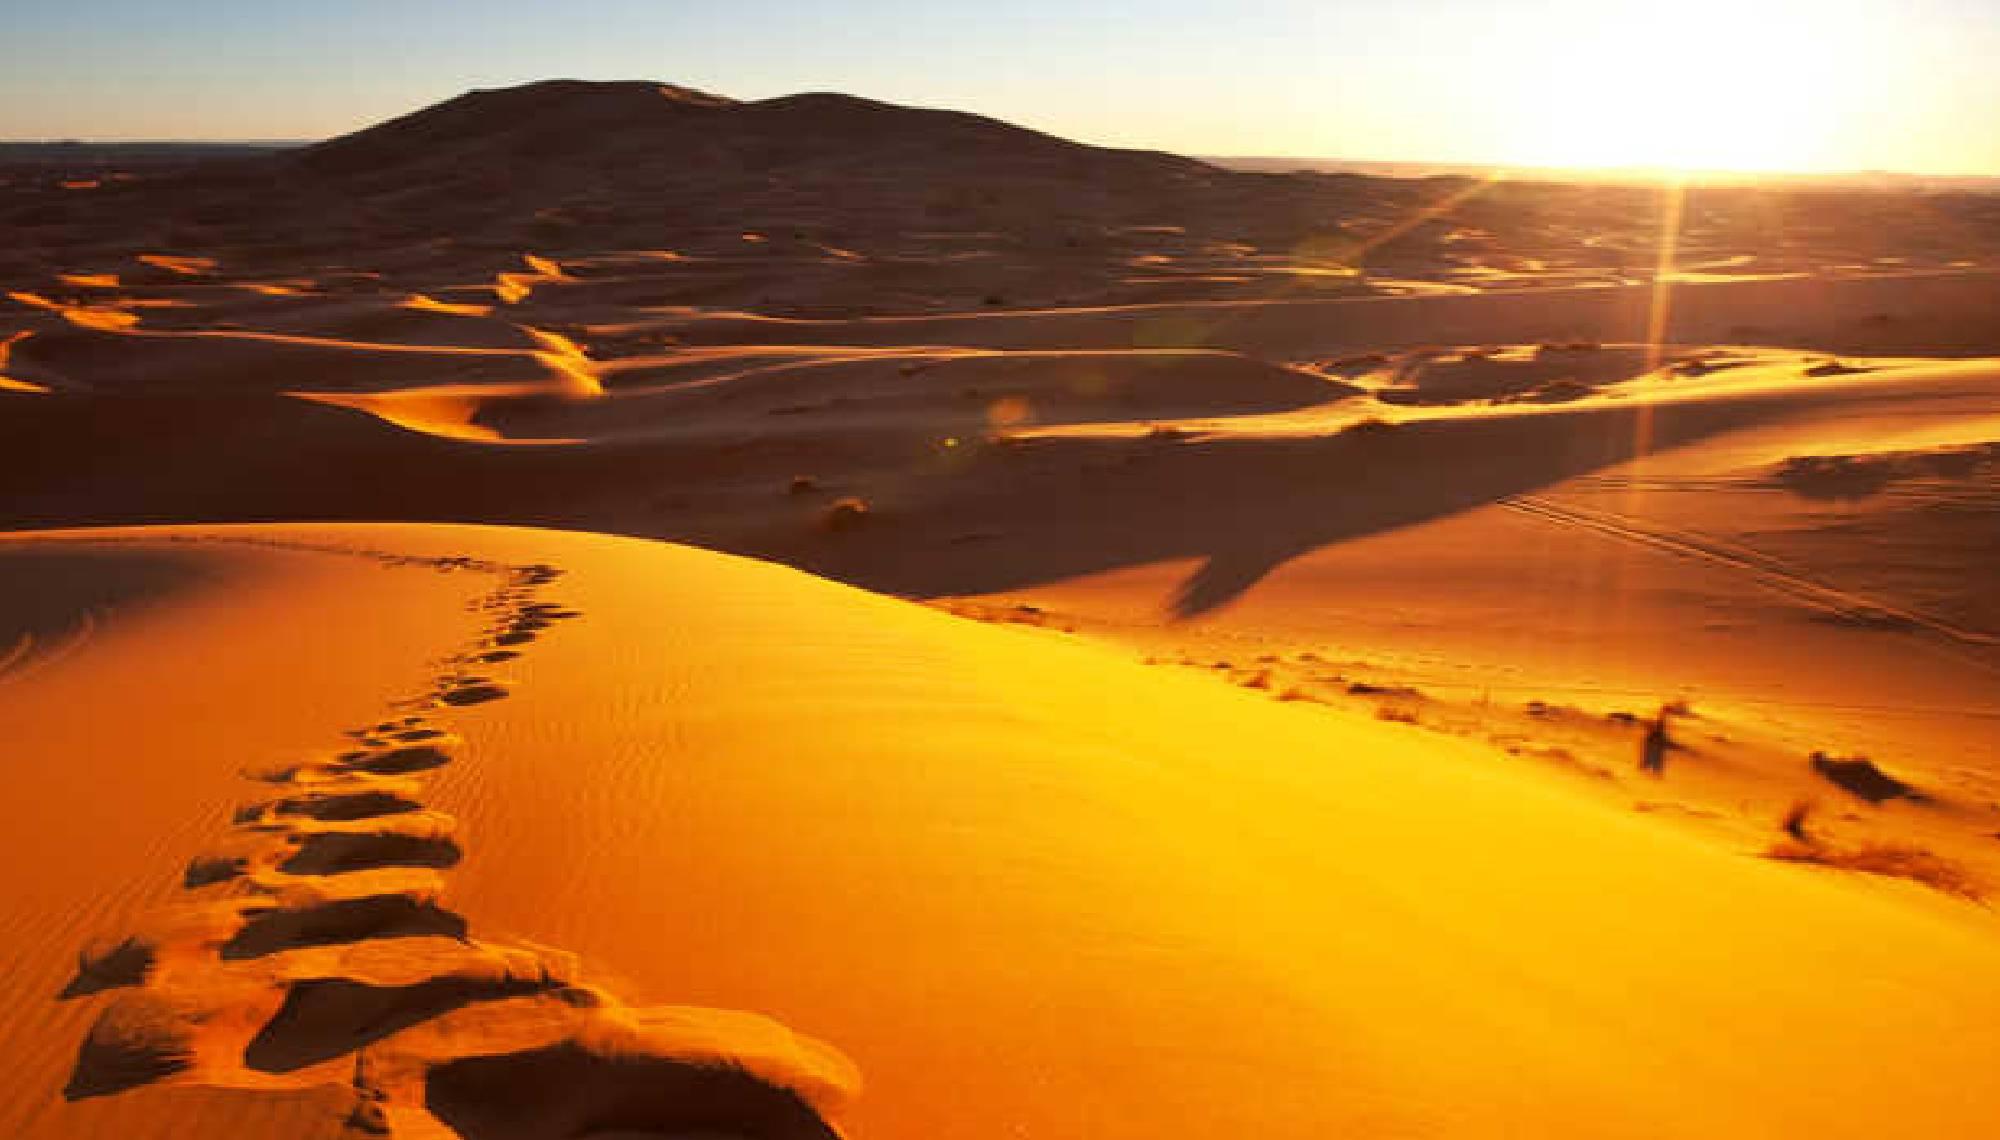 senderismo dunas del sahara